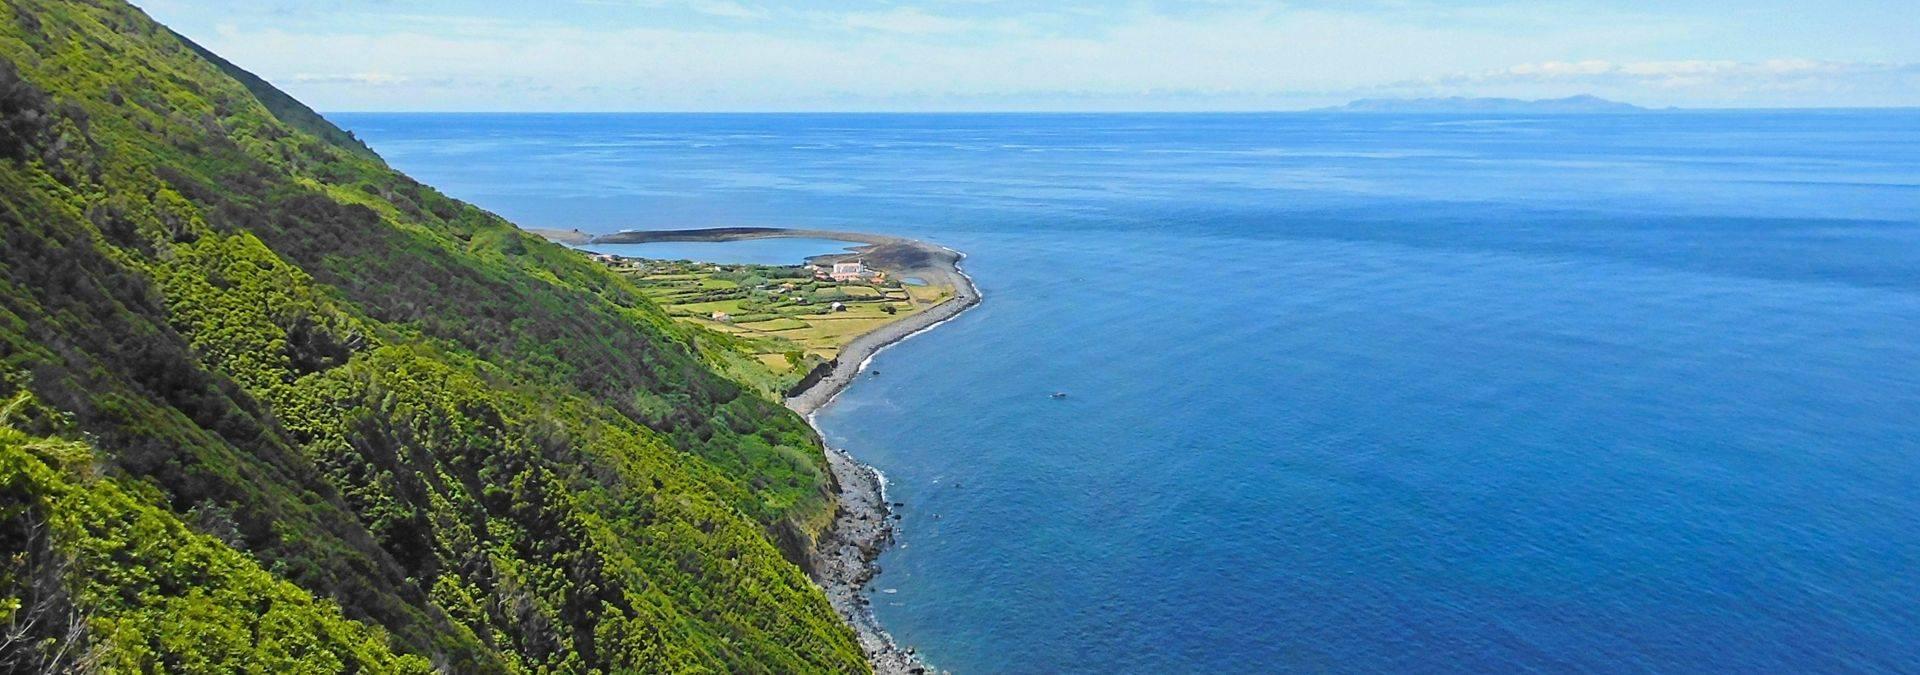 Sao Jorge, The Azores. Credit: Futurismo Azores Adventure